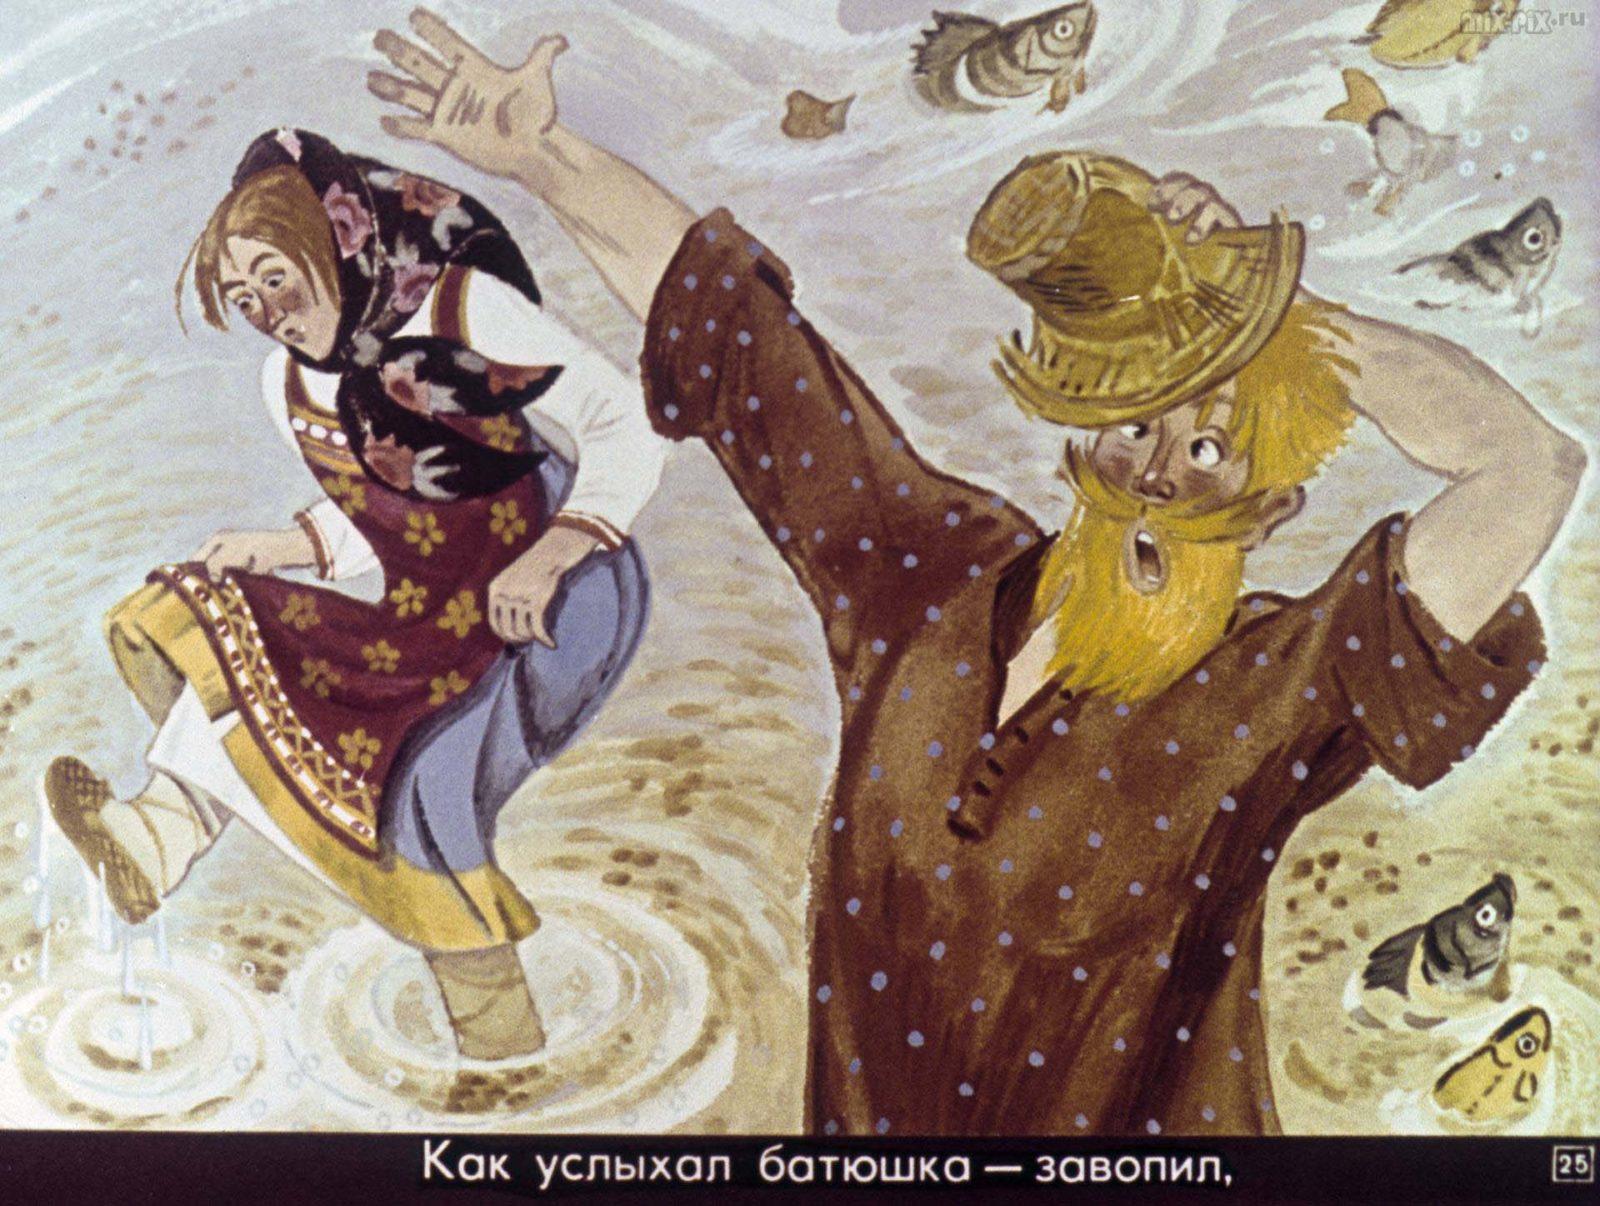 Курочка Ряба (1981) 43